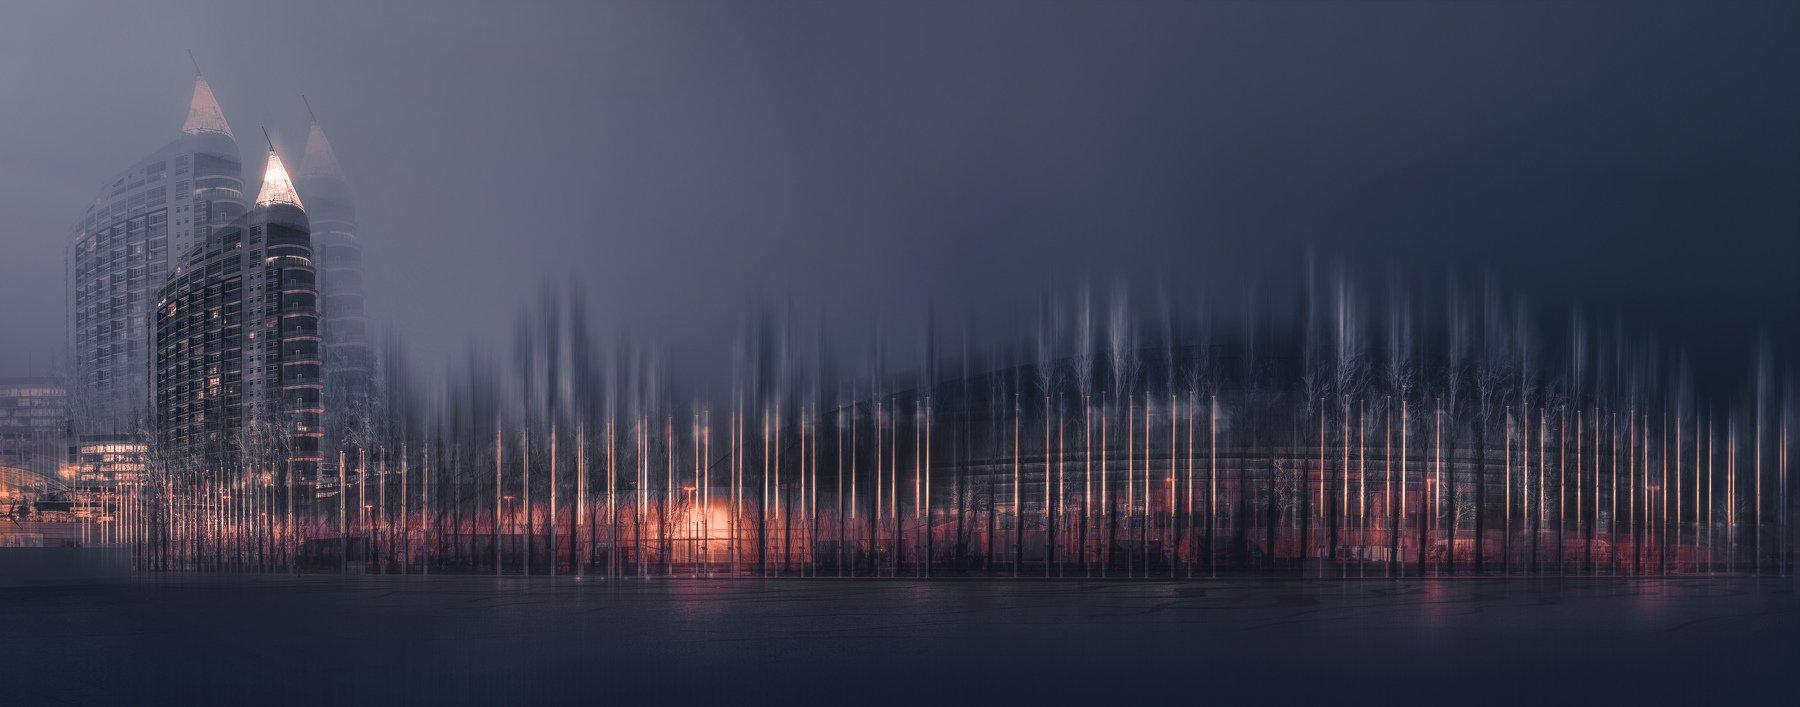 city, abstract, conceptual , lisbon, portugal, old, europe, creative, Antonio Bernardino